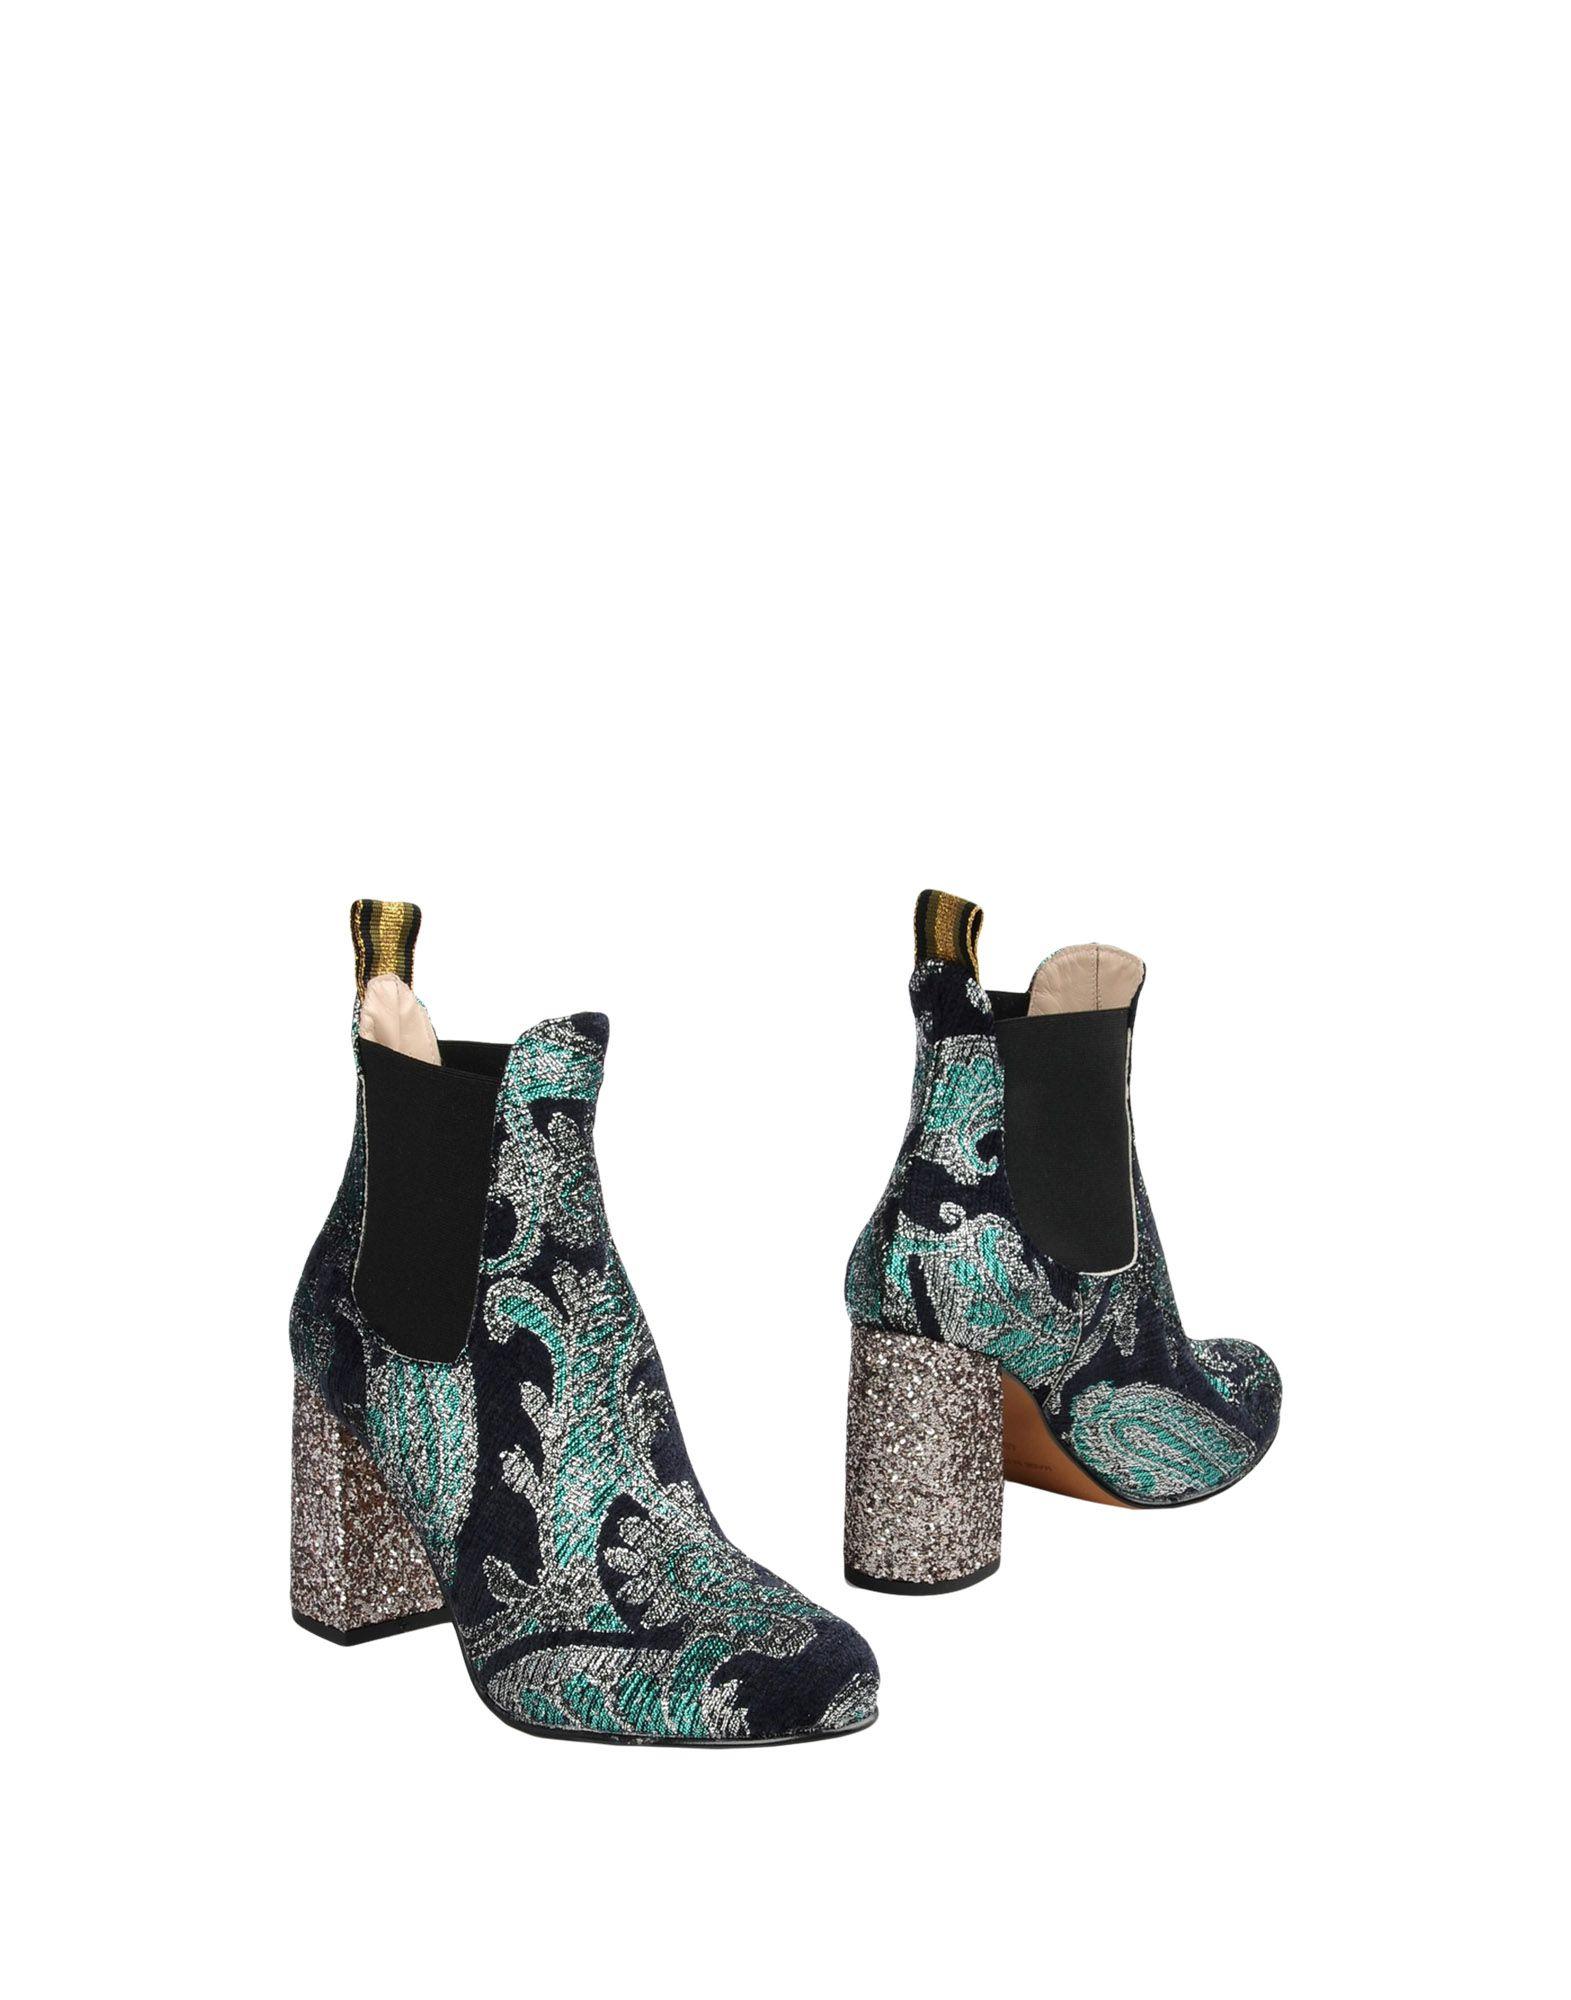 Leo Studio  Design Jacquard Ankle Boots  Studio 11363110LW Heiße Schuhe 8c92cd